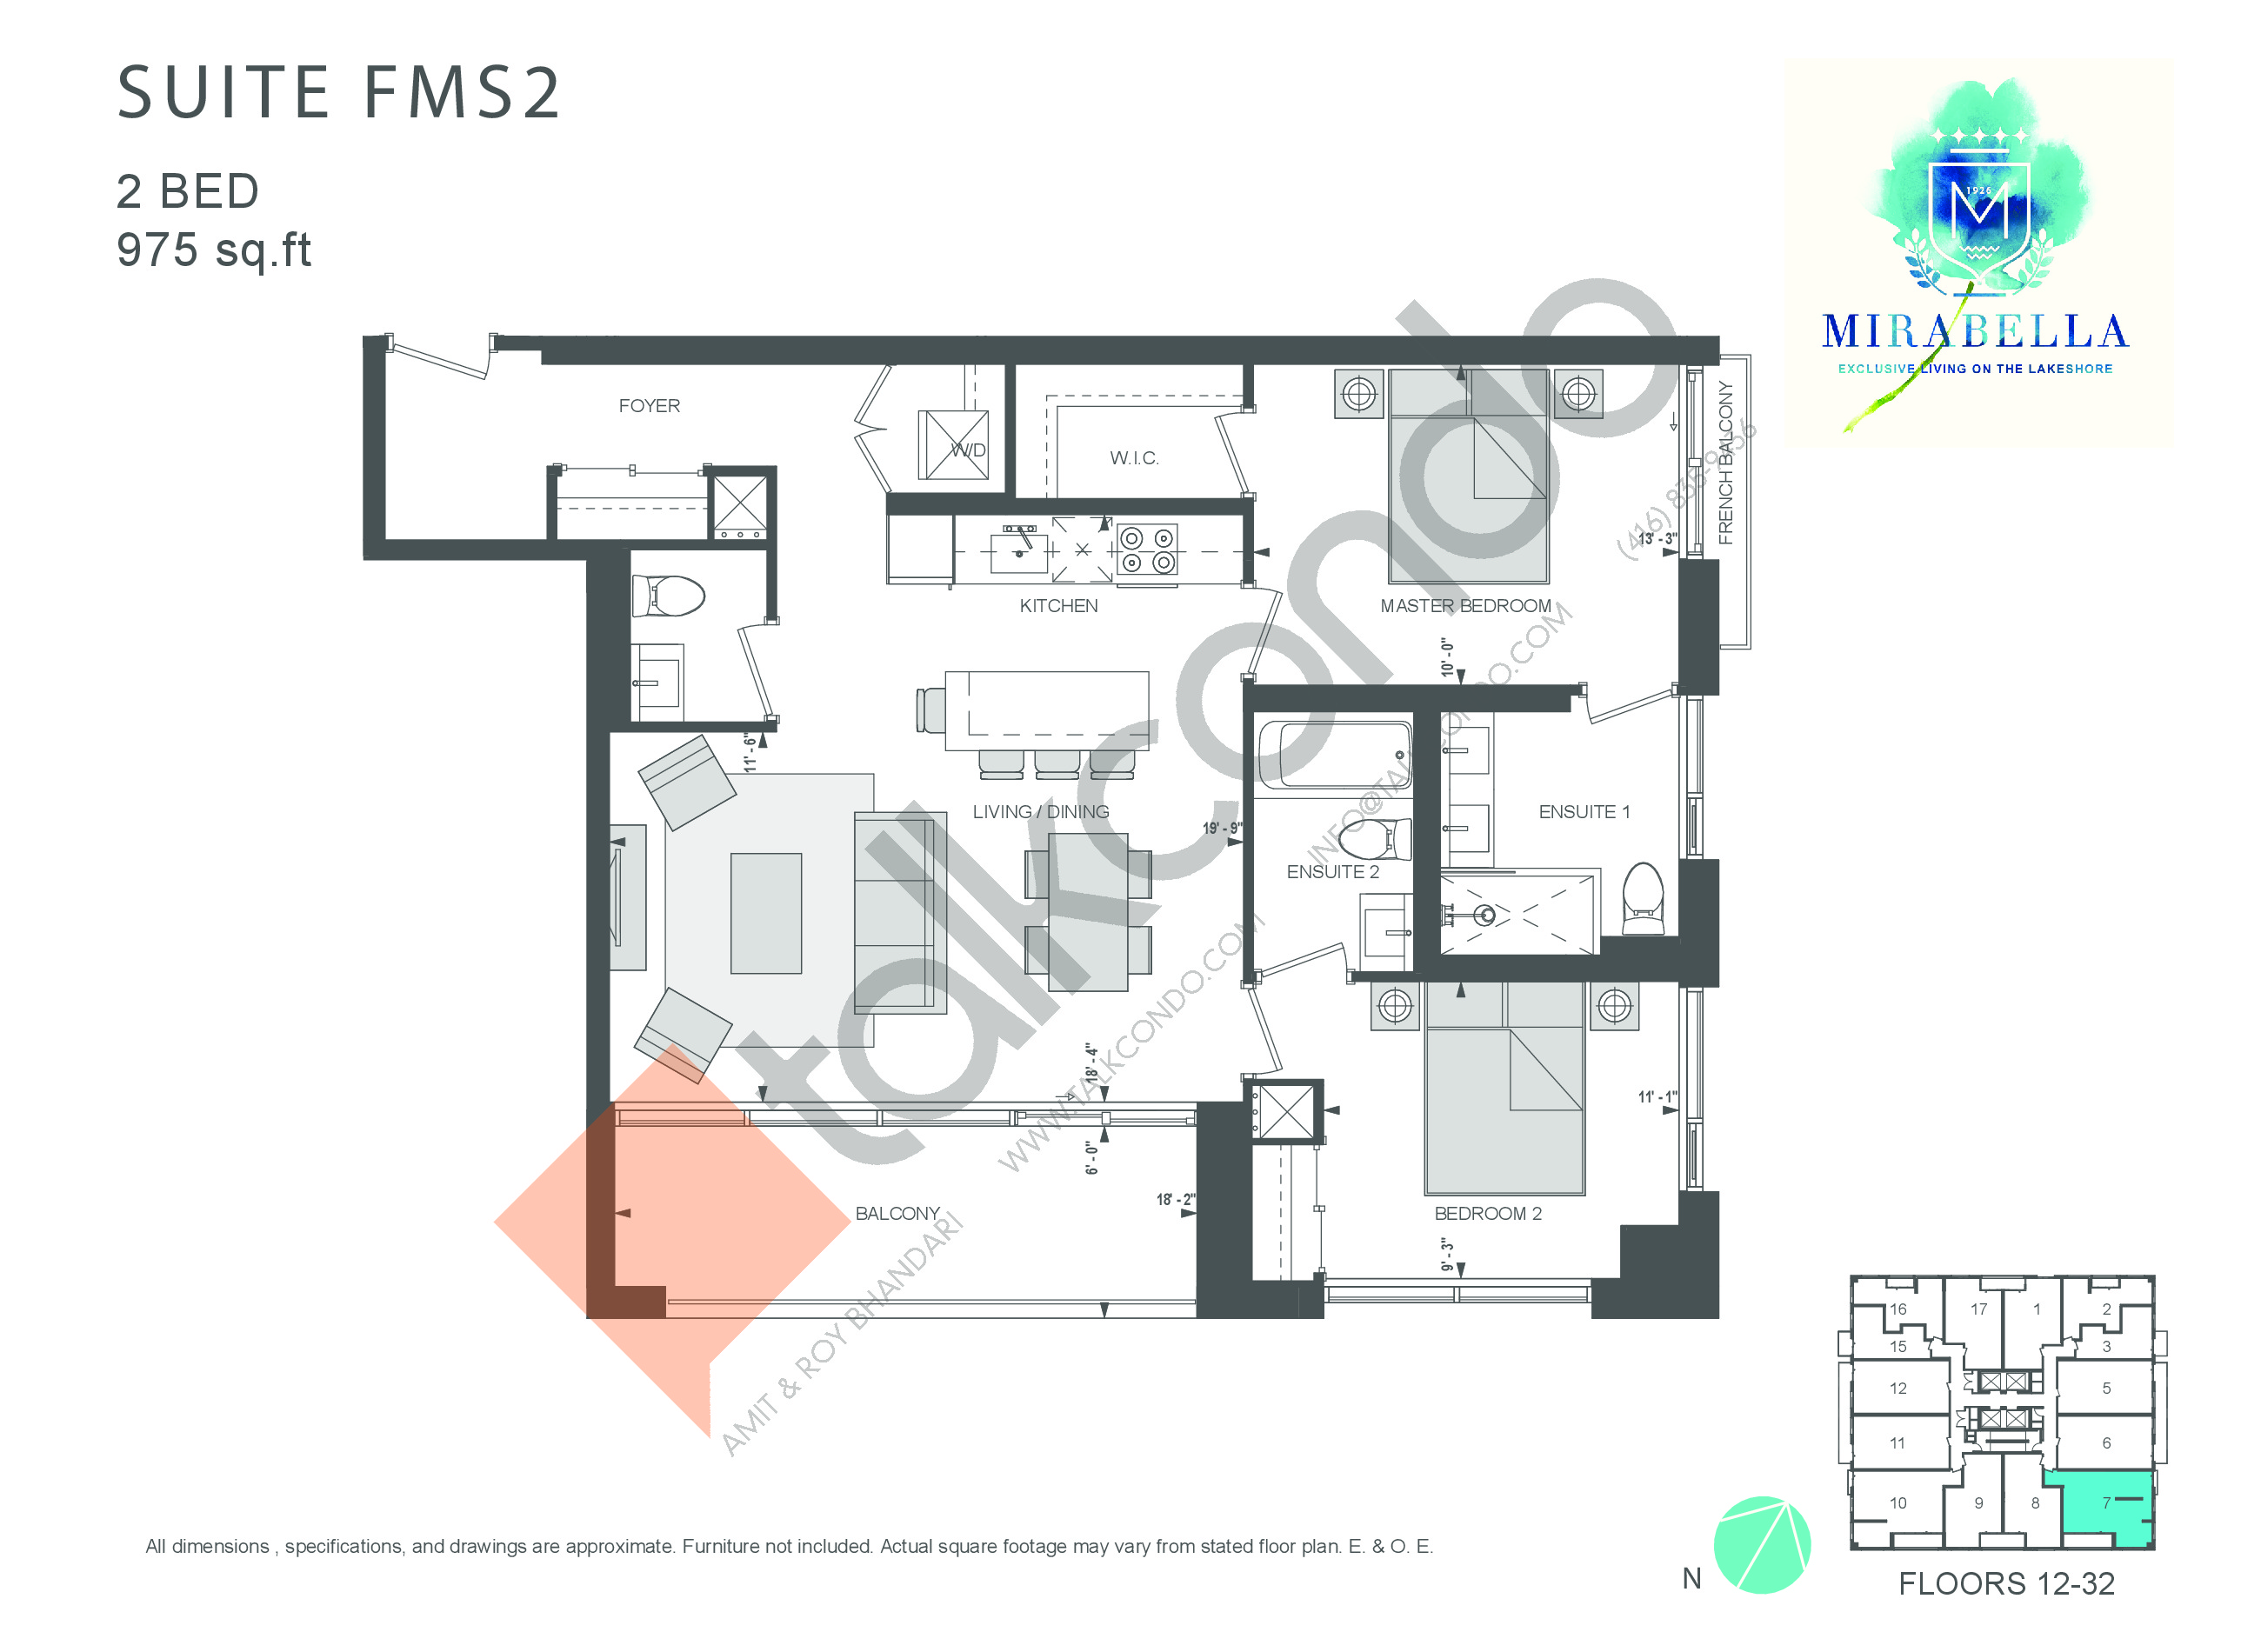 Suite FMS2 Floor Plan at Mirabella Luxury Condos East Tower - 975 sq.ft